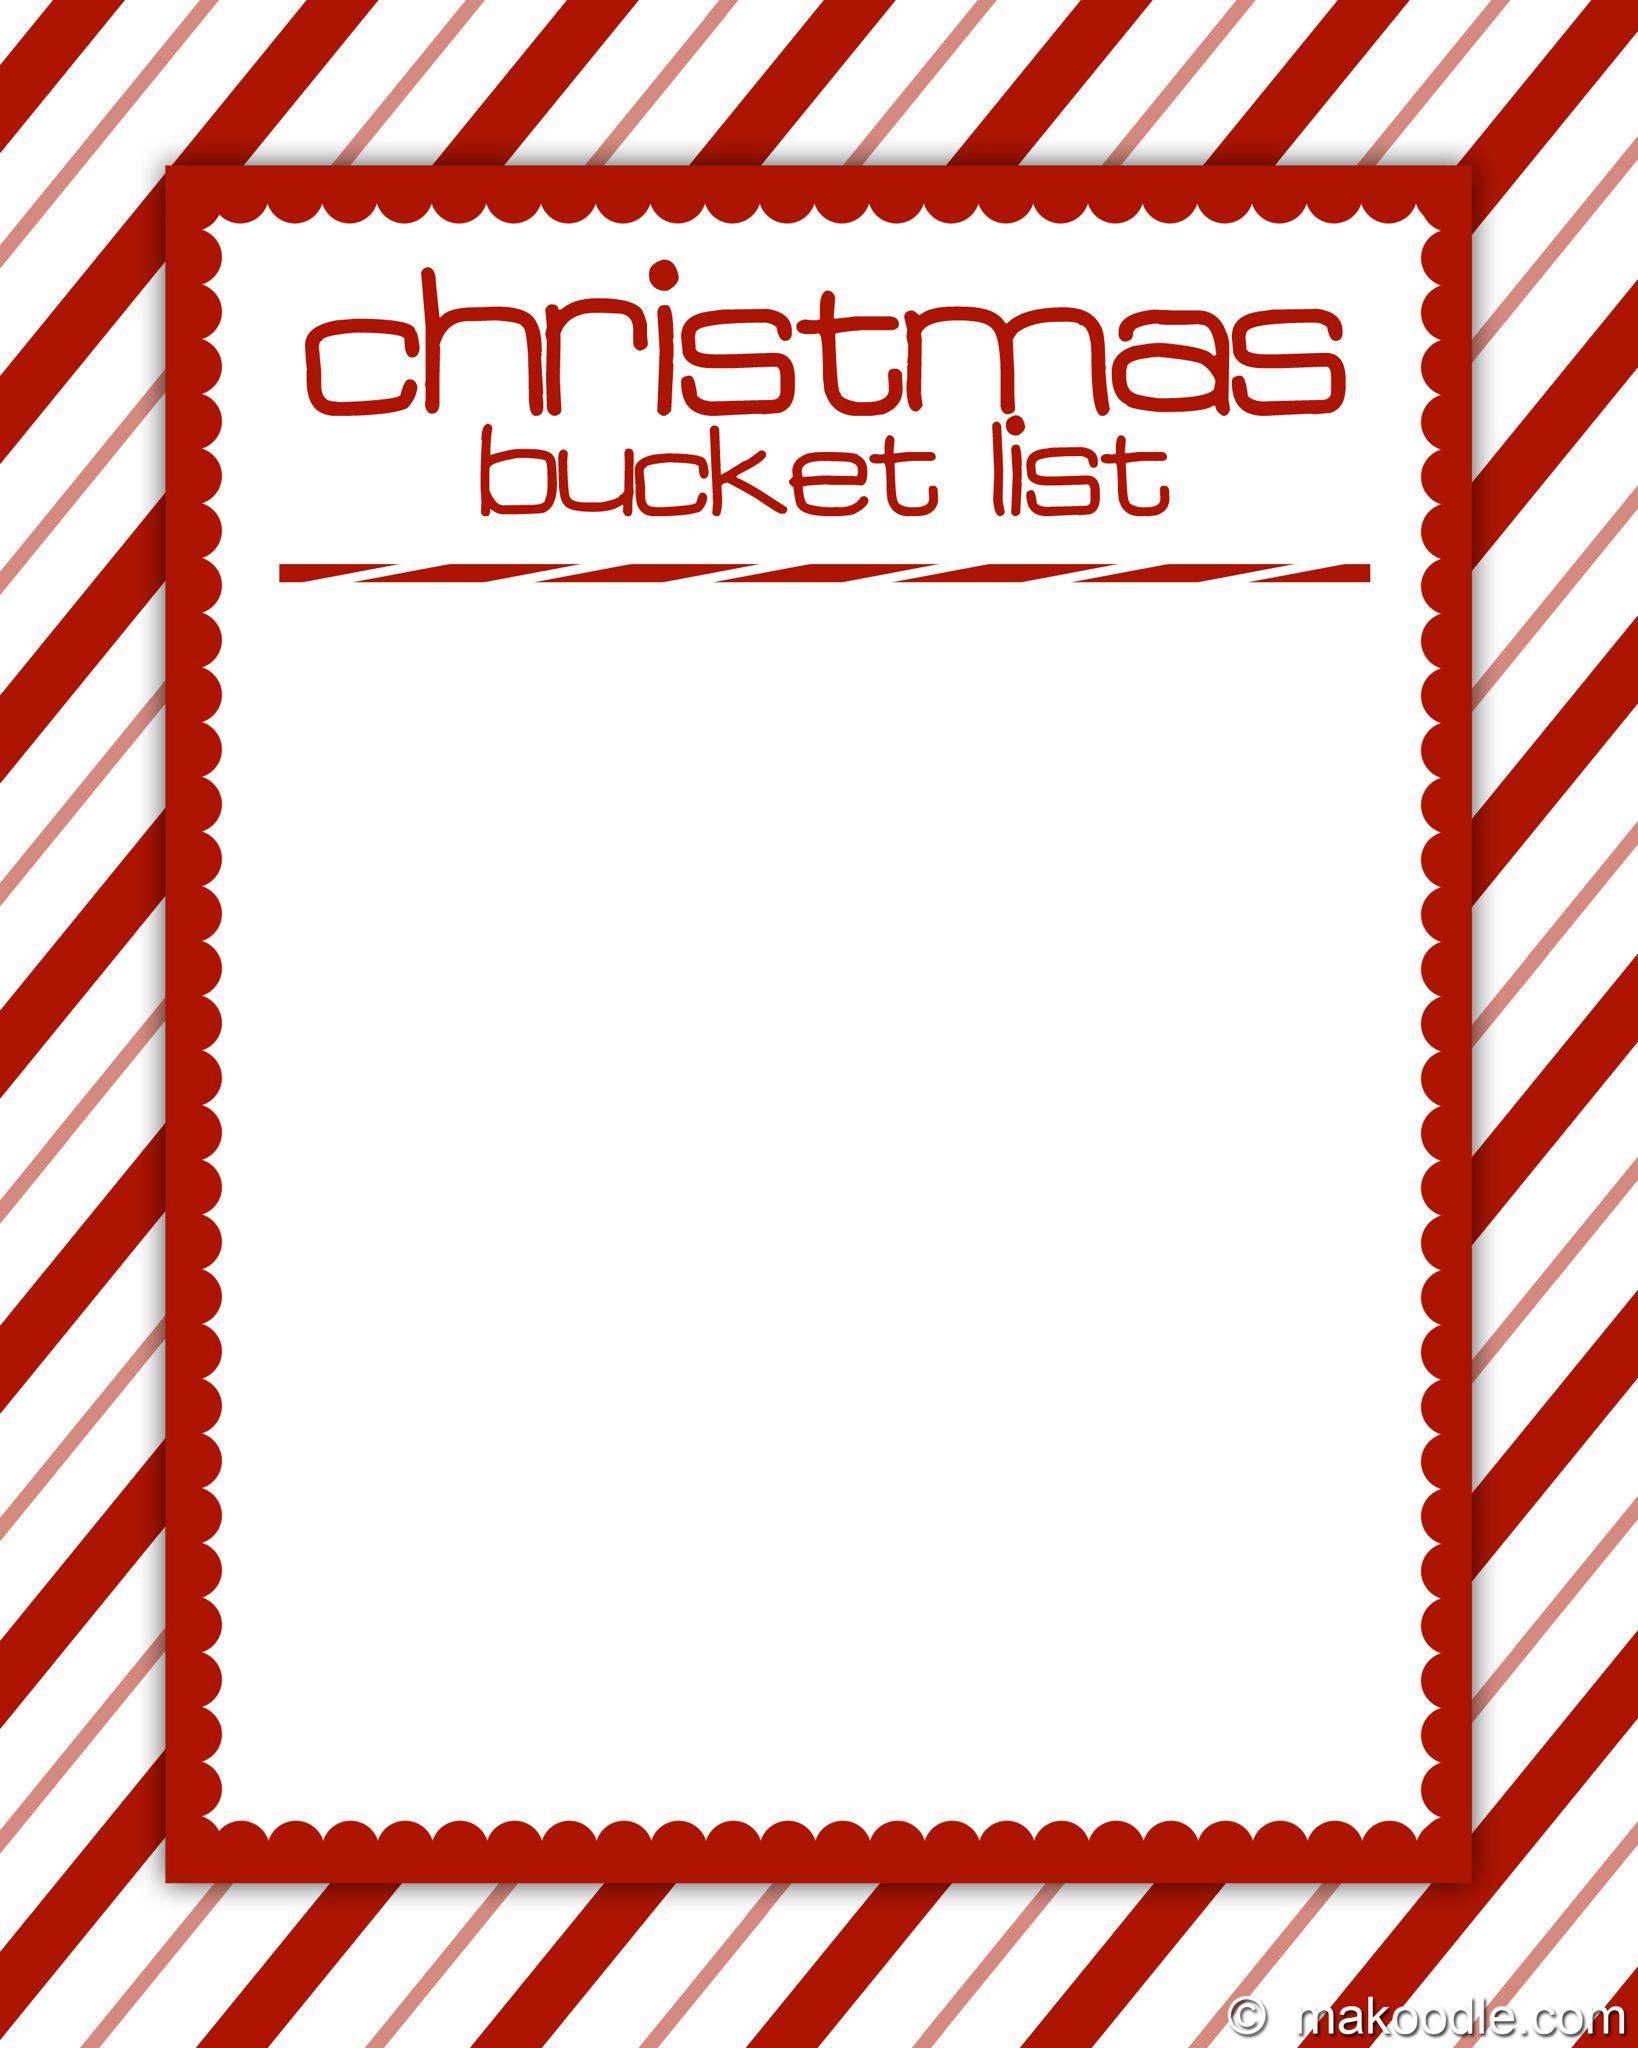 Christmas Card Backgrounds Christmas Bucket List Christmas Bucket List Printable Christmas Bucket